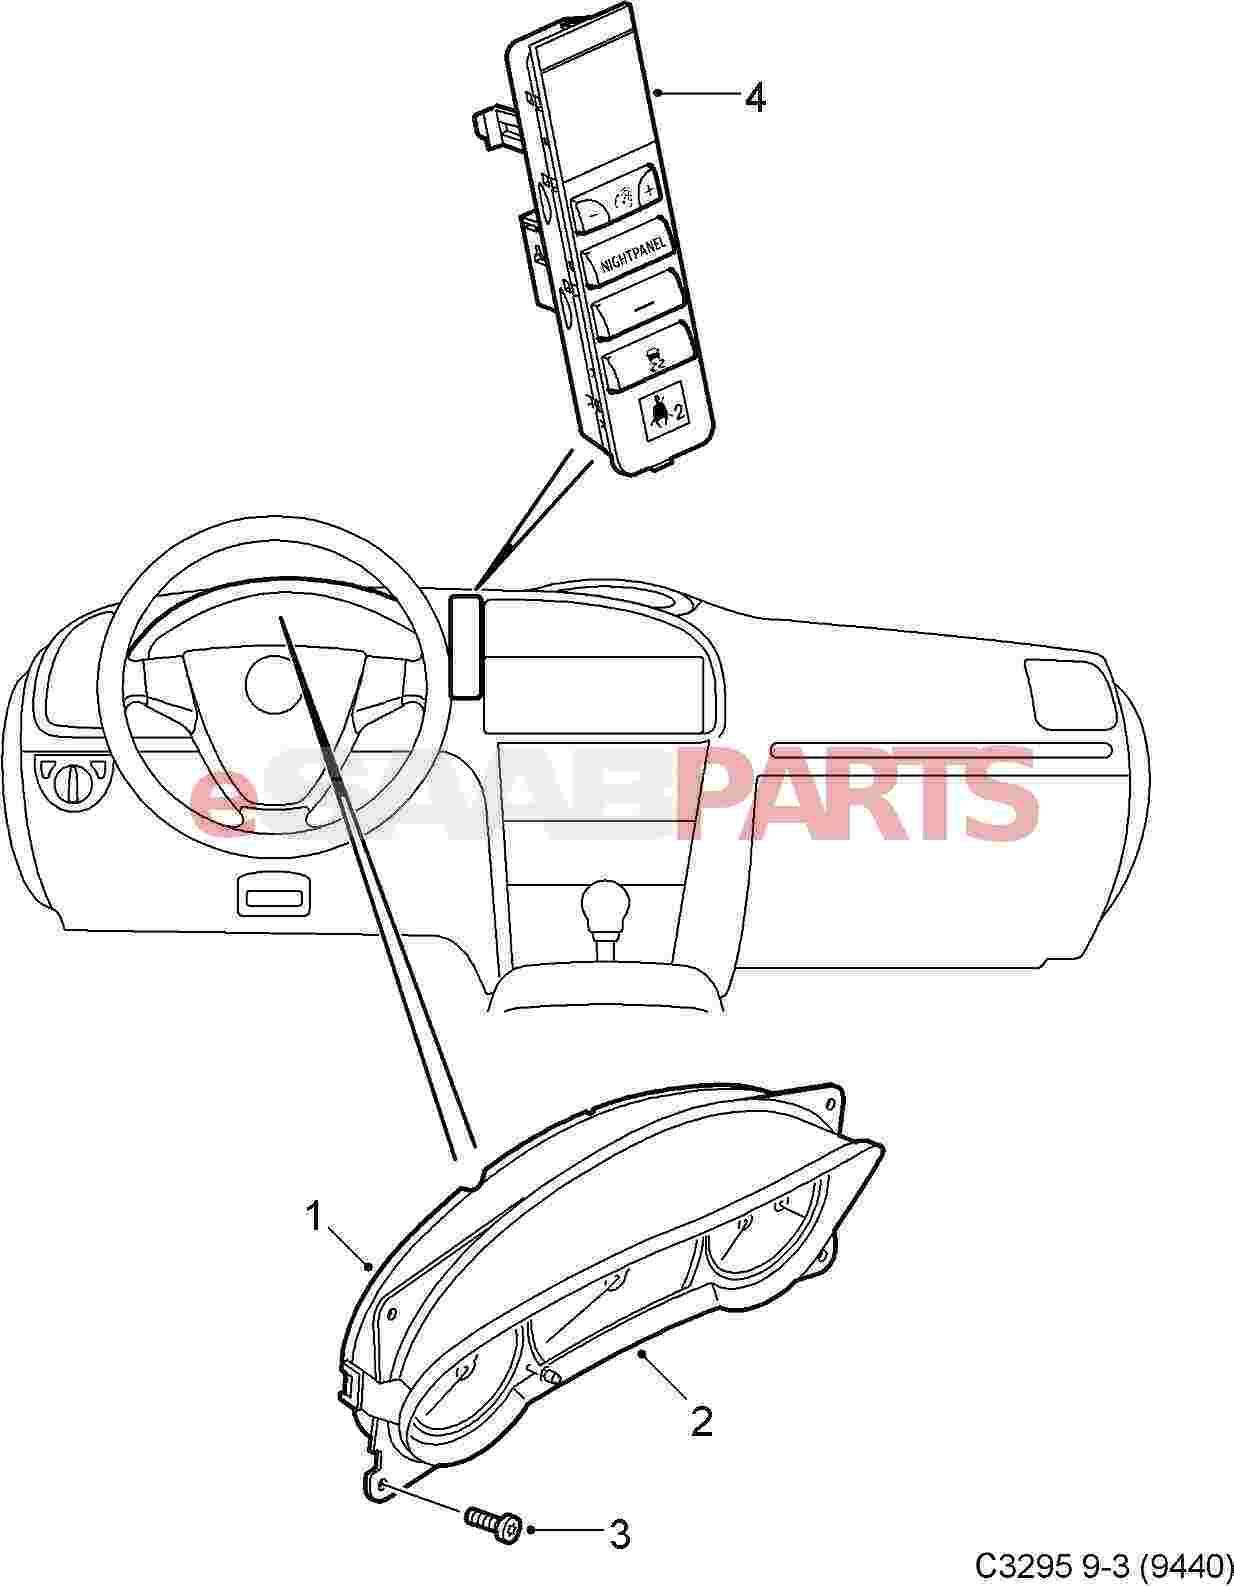 Mannanrengassarja Wossner 910 Mm likewise 3 V Band Spaendeband Og Flange besides Jt Auspuffanlage Halbsatz 3 Ab Kat 58l Tank 2 D fer 9 3 Ii Mj 03 likewise Lng EN srub 171 iprod 3110 p 1v5 Fuel Pump Gasket For Saab 900 Classic 8 Valves Injection additionally Viewparts. on saab 9000 performance parts